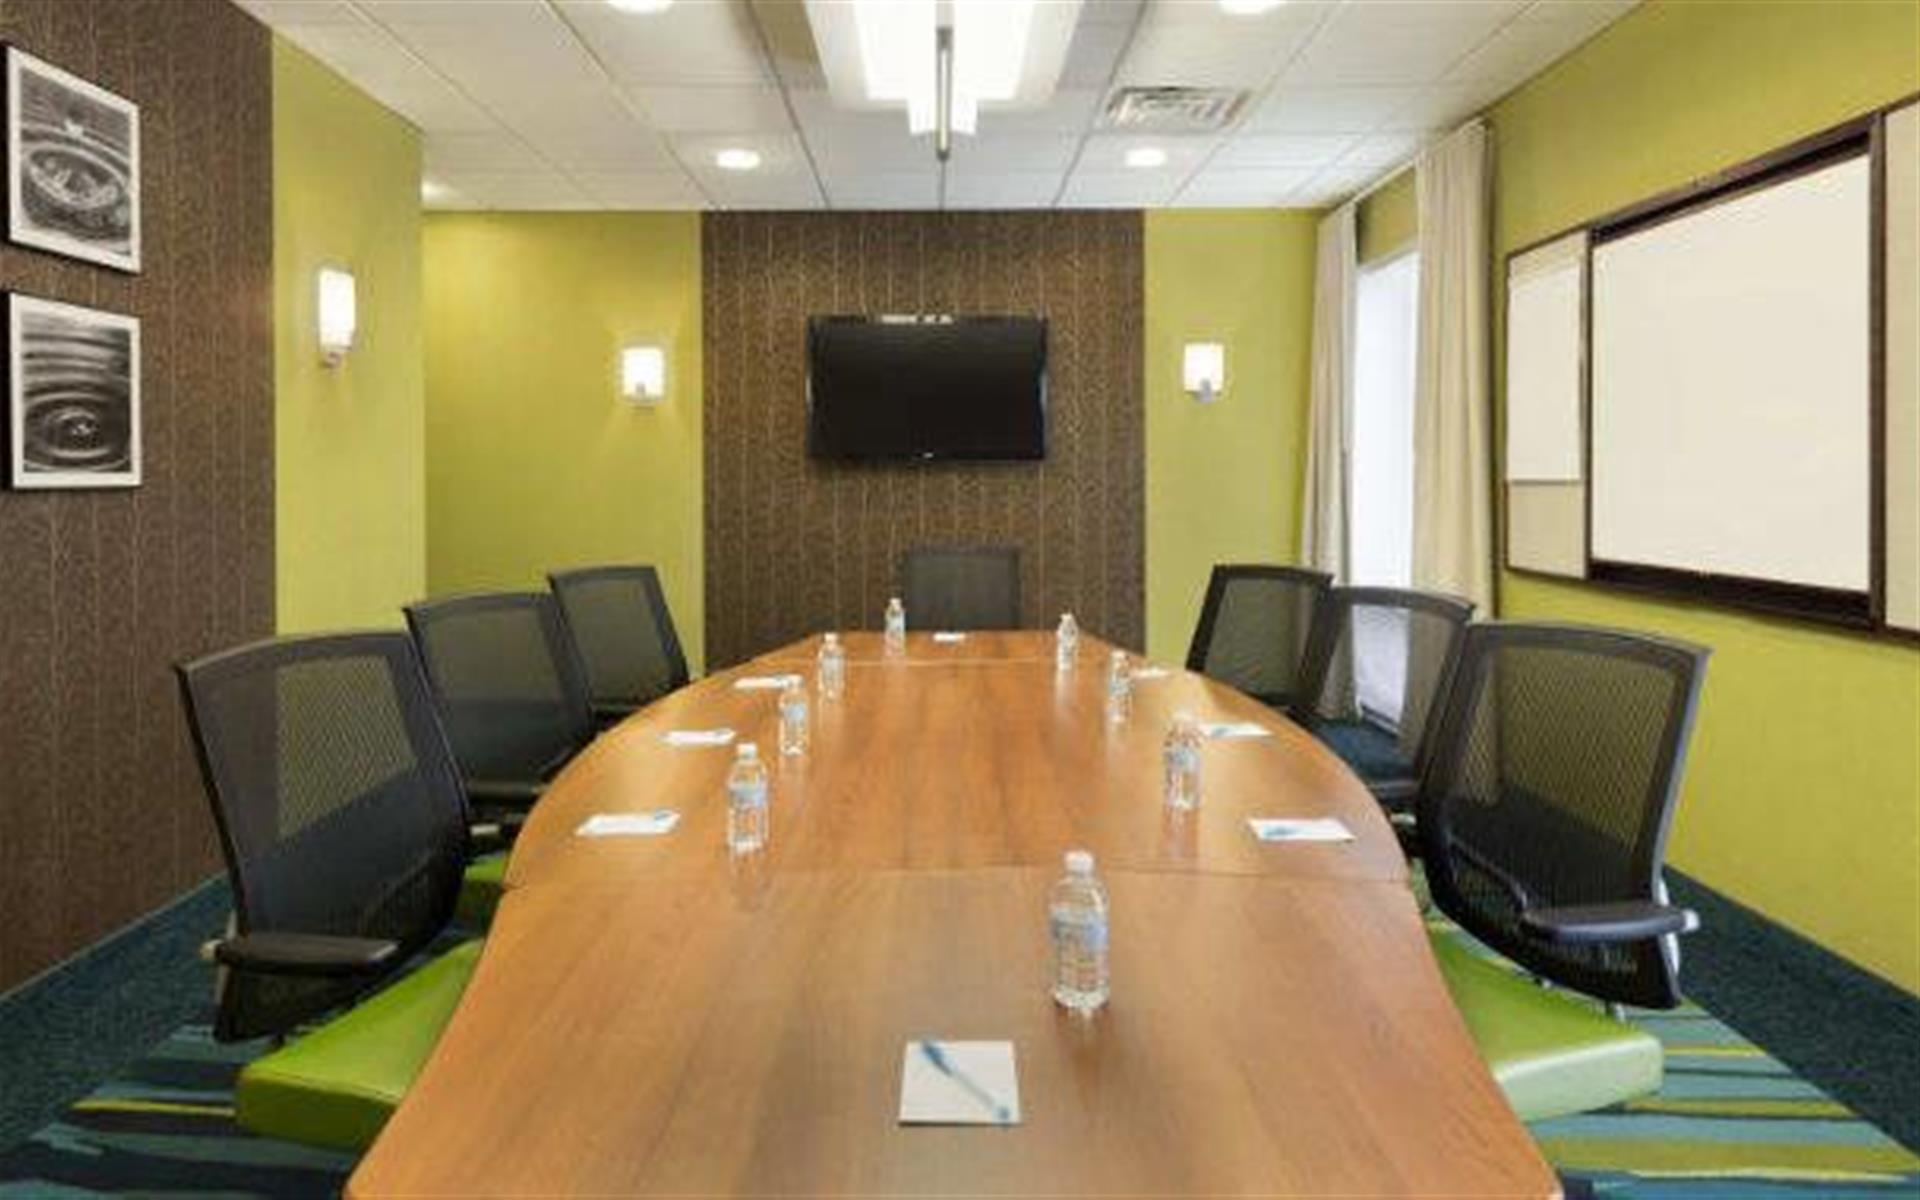 SpringHill Suites by Marriott Philadelphia Langhorne - The Langhorne Room